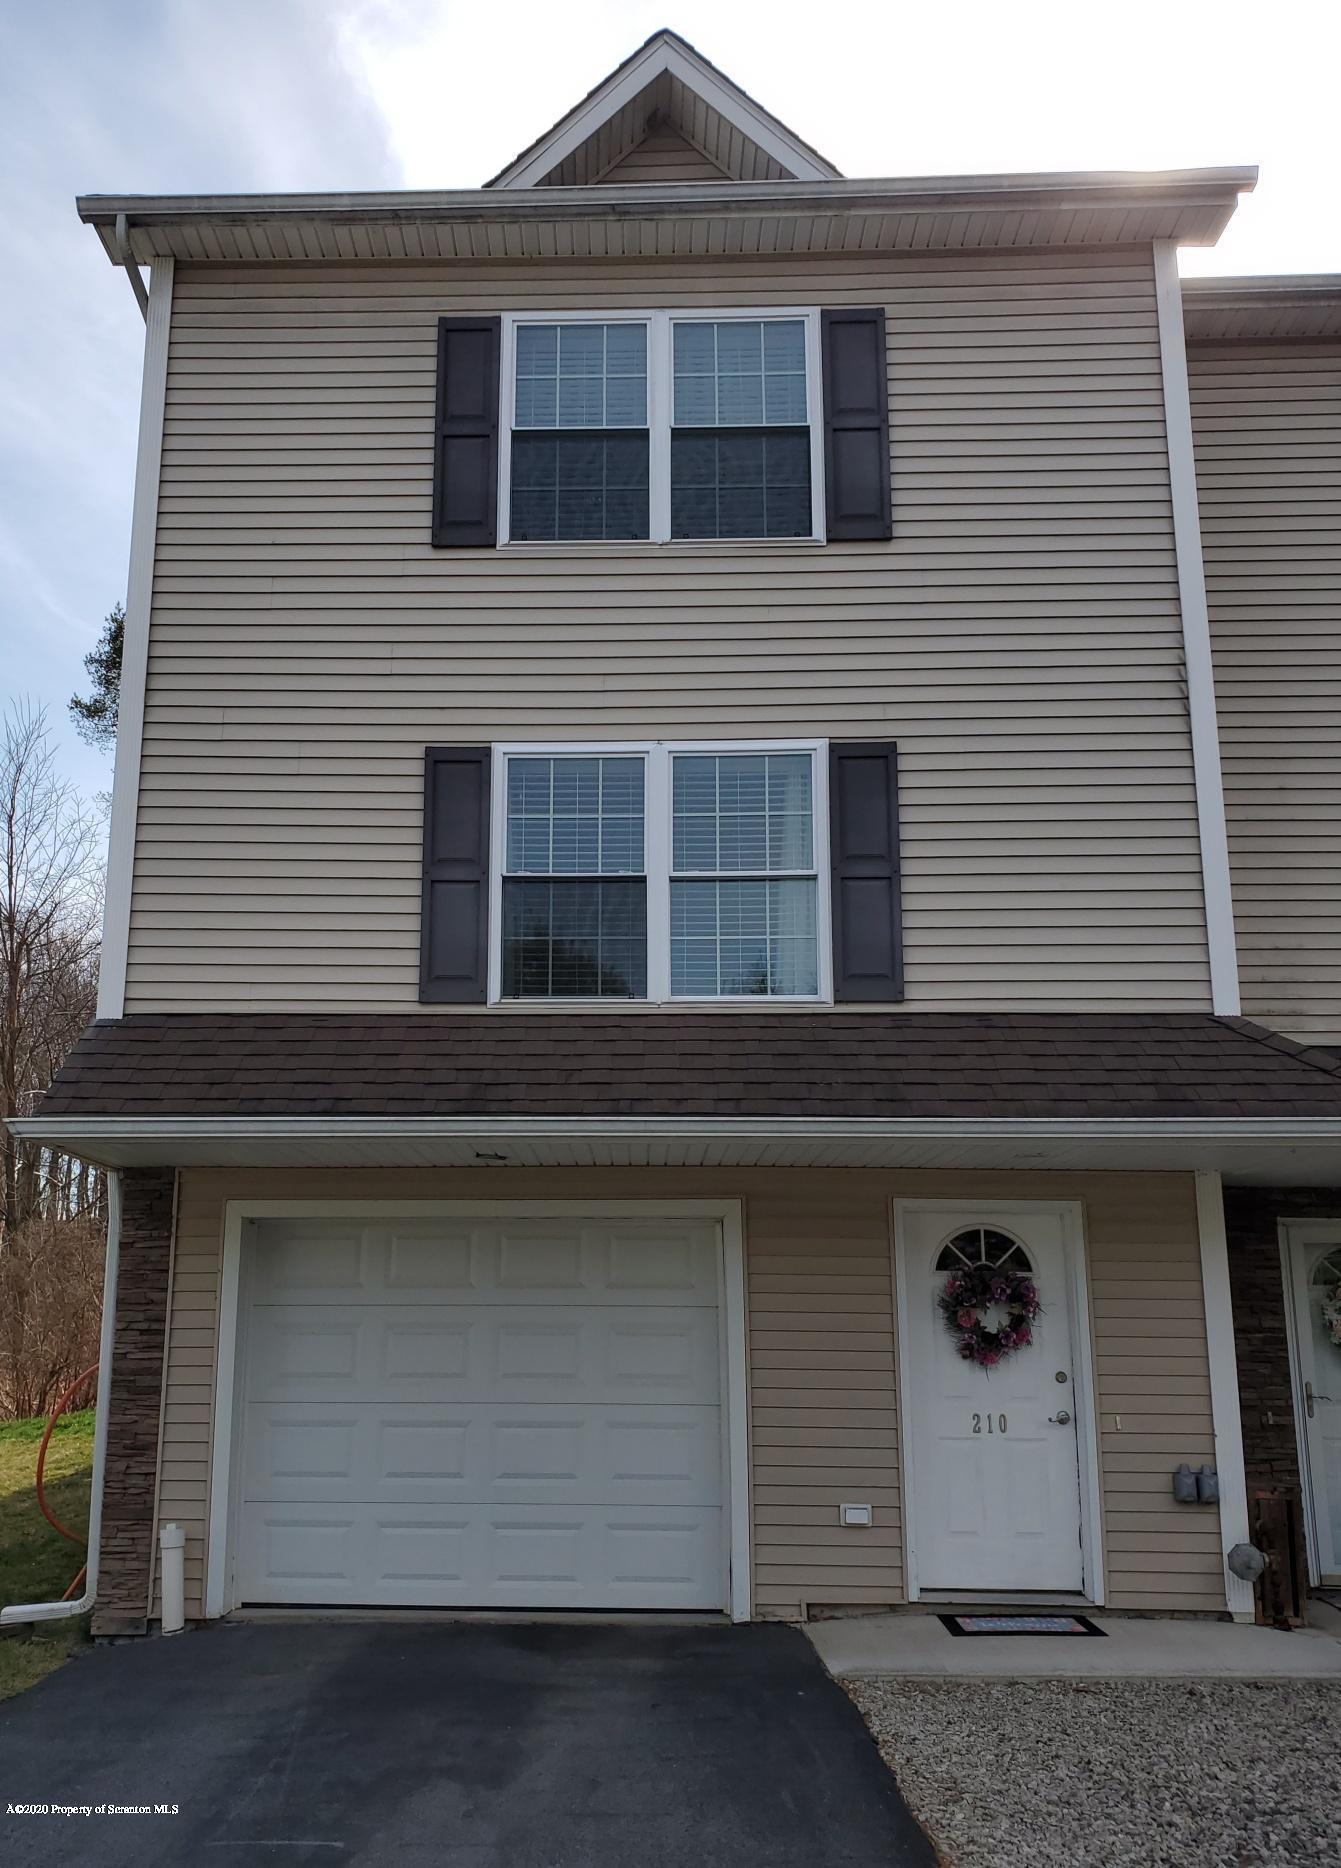 210 Park Edge Ln, Scranton, Pennsylvania 18504, 3 Bedrooms Bedrooms, 6 Rooms Rooms,2 BathroomsBathrooms,Residential - condo/townhome,For Sale,Park Edge,20-1246